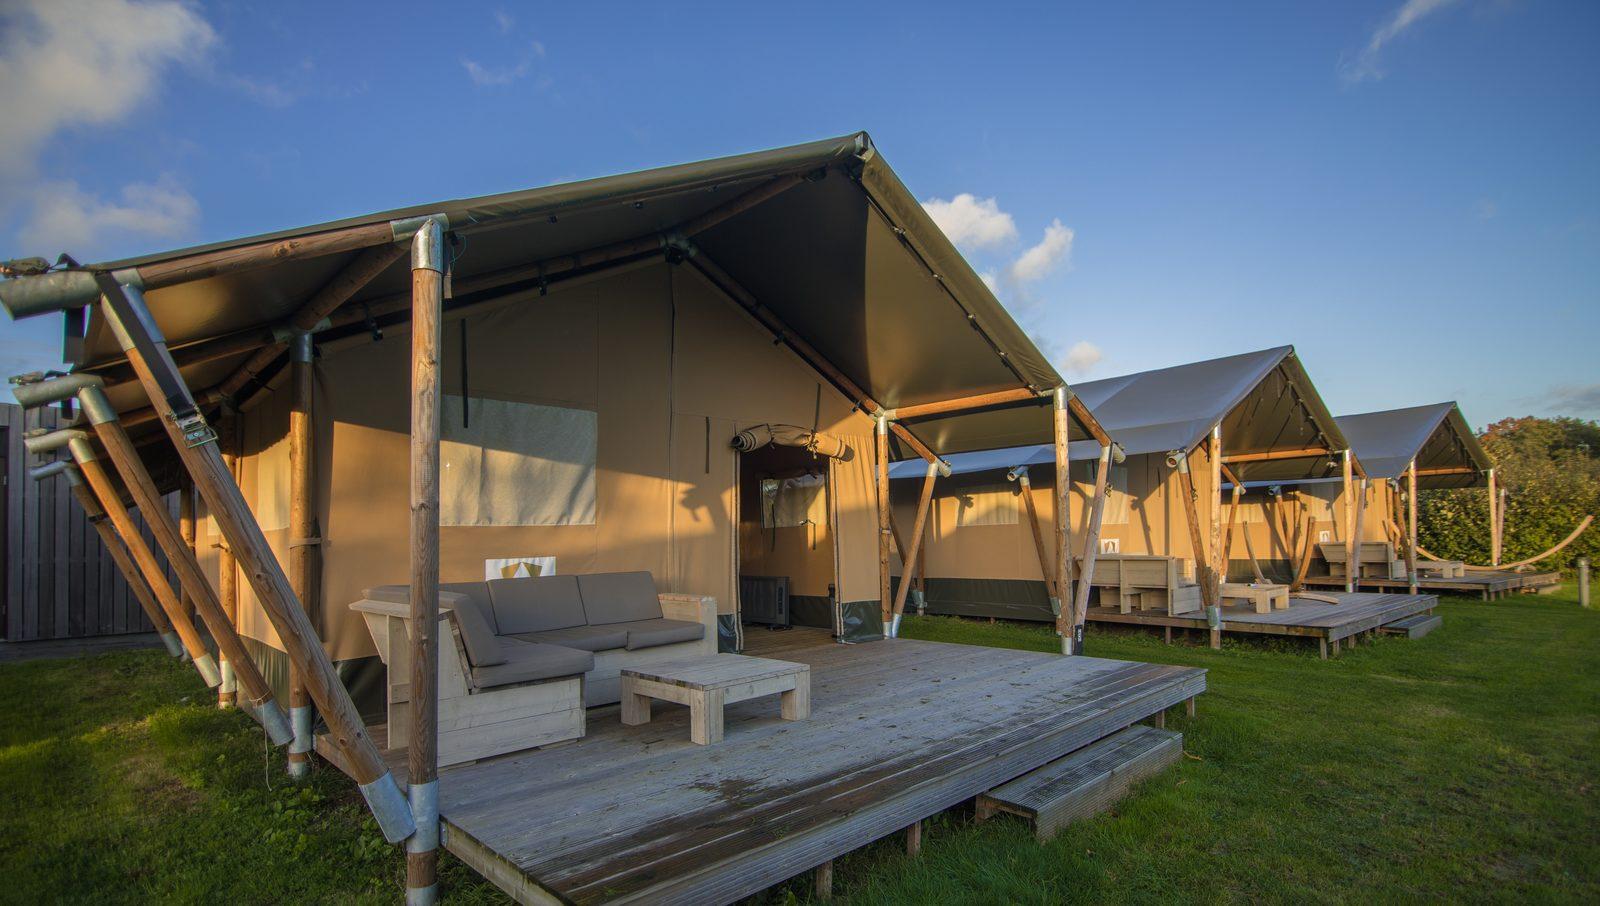 5-Sterne-Campingplatz